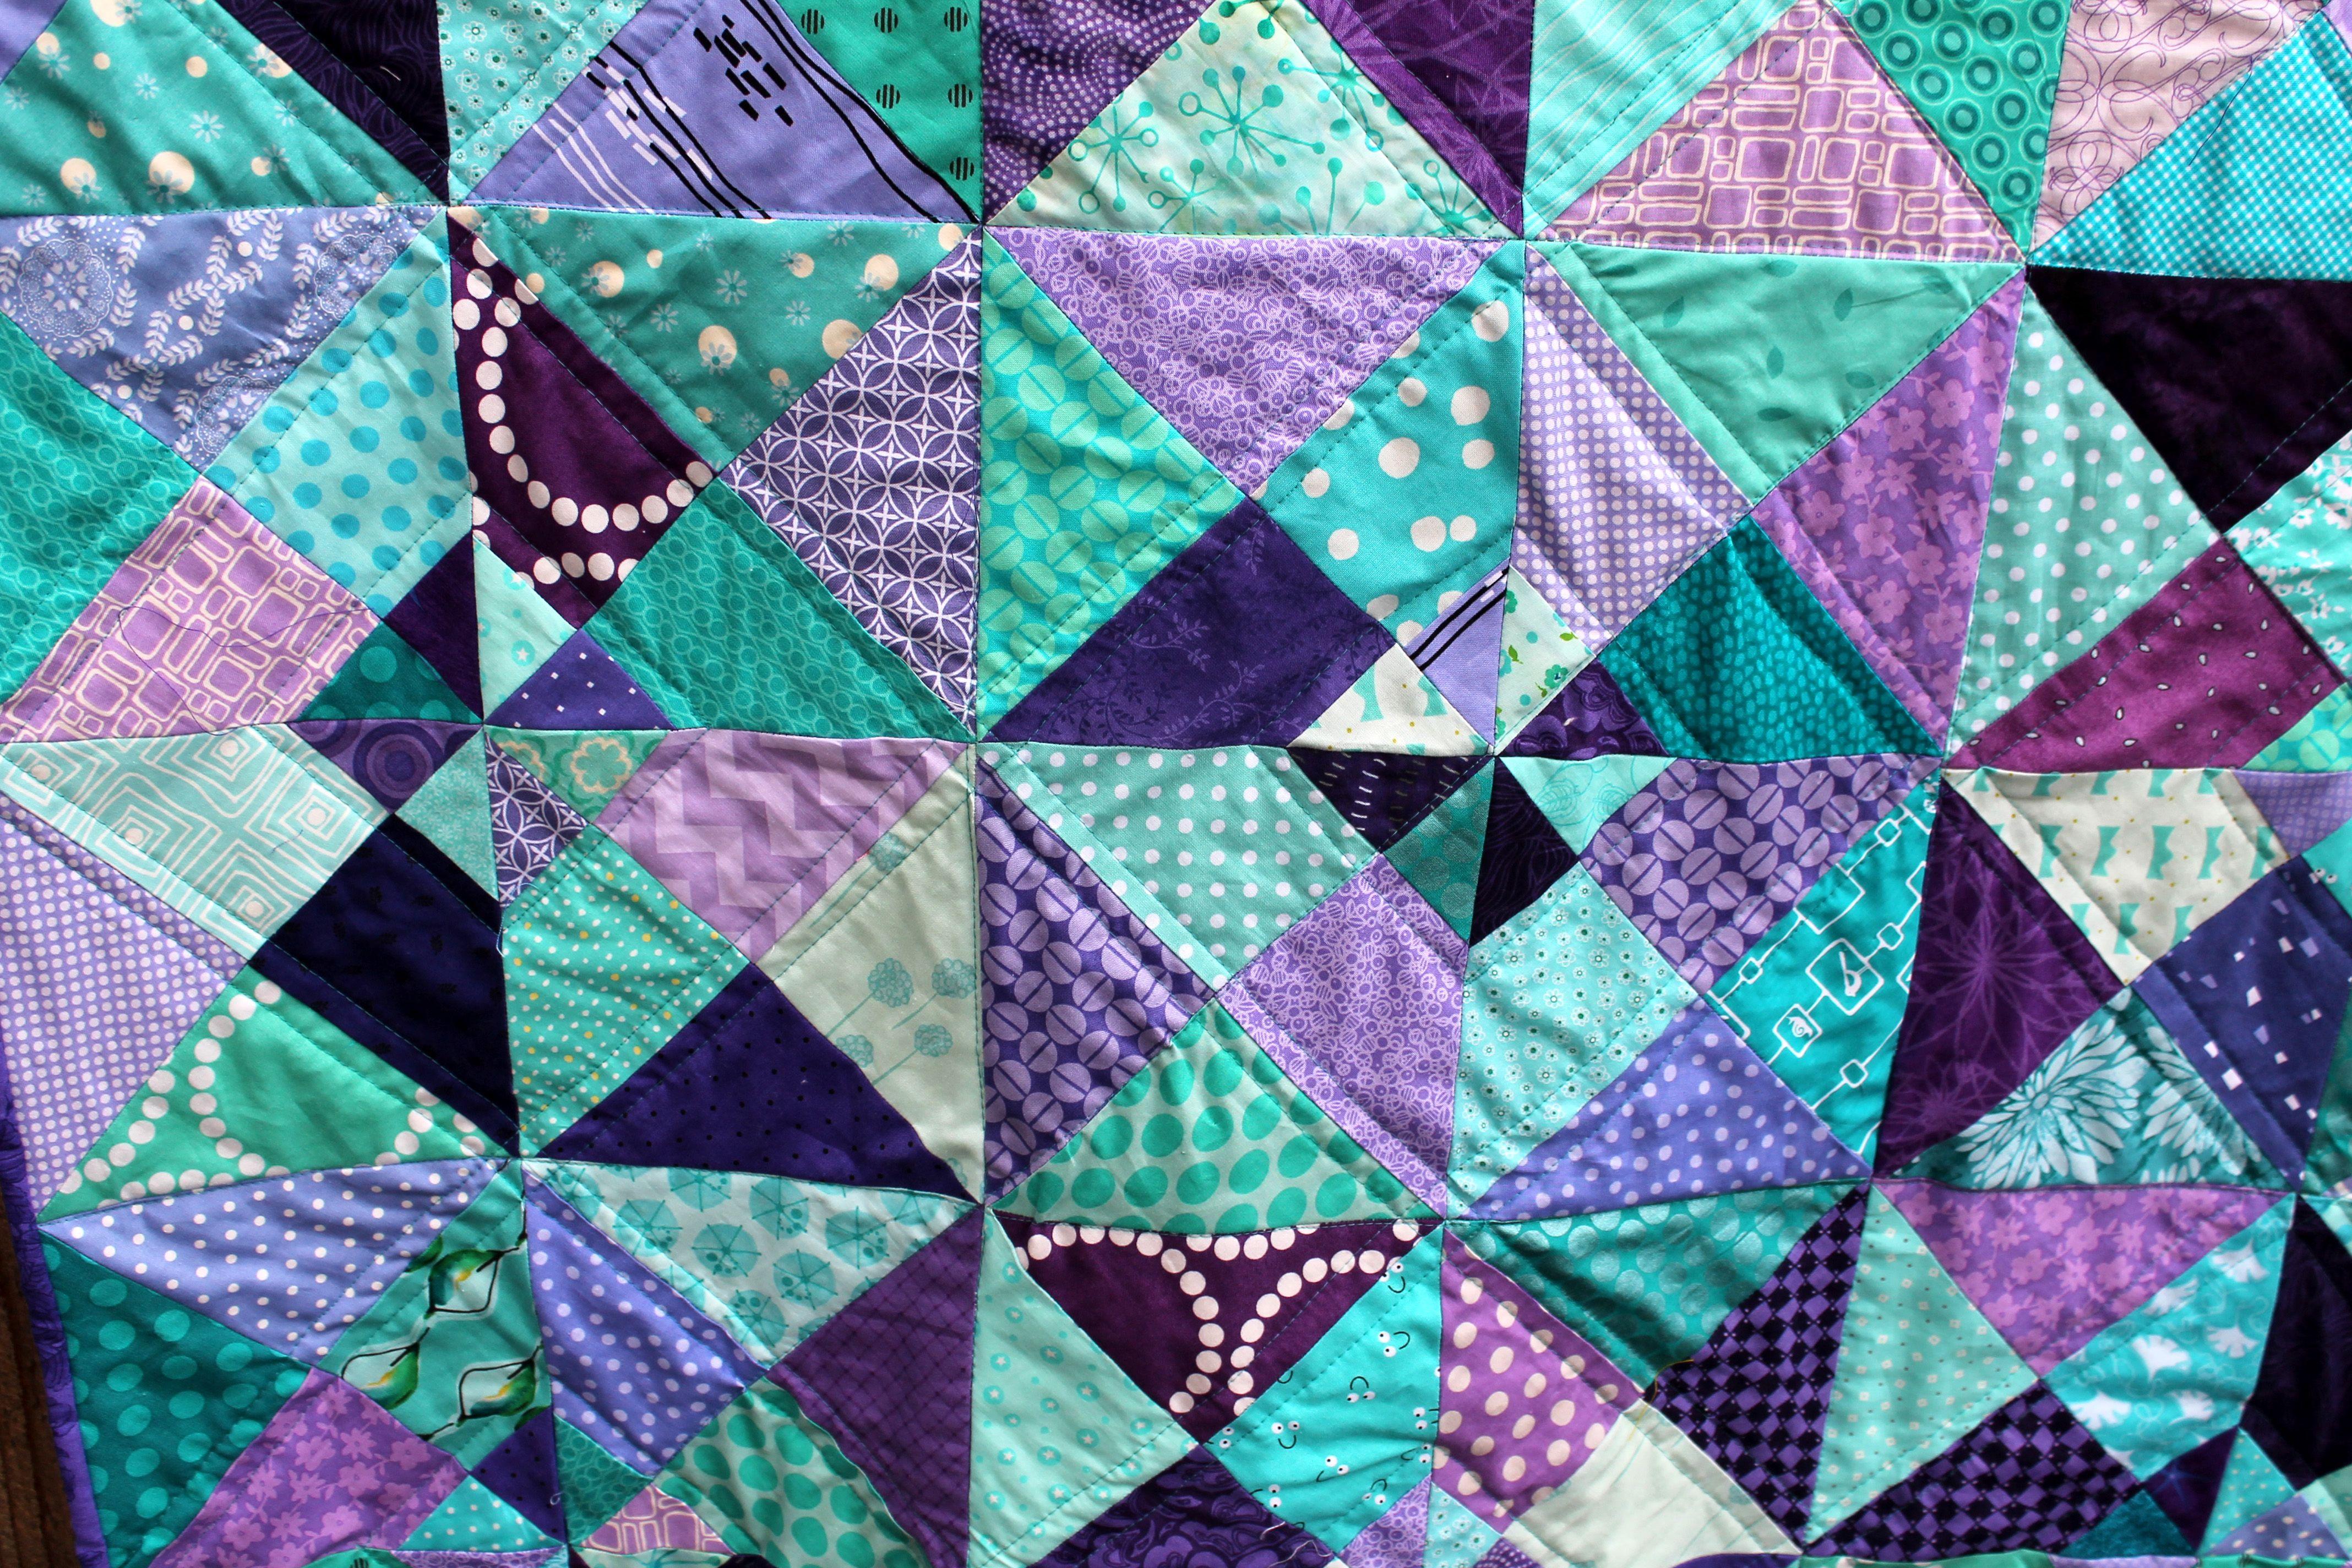 aqua purple bold quilt   quilt color ideas   Pinterest   Aqua ... : quilt color ideas - Adamdwight.com